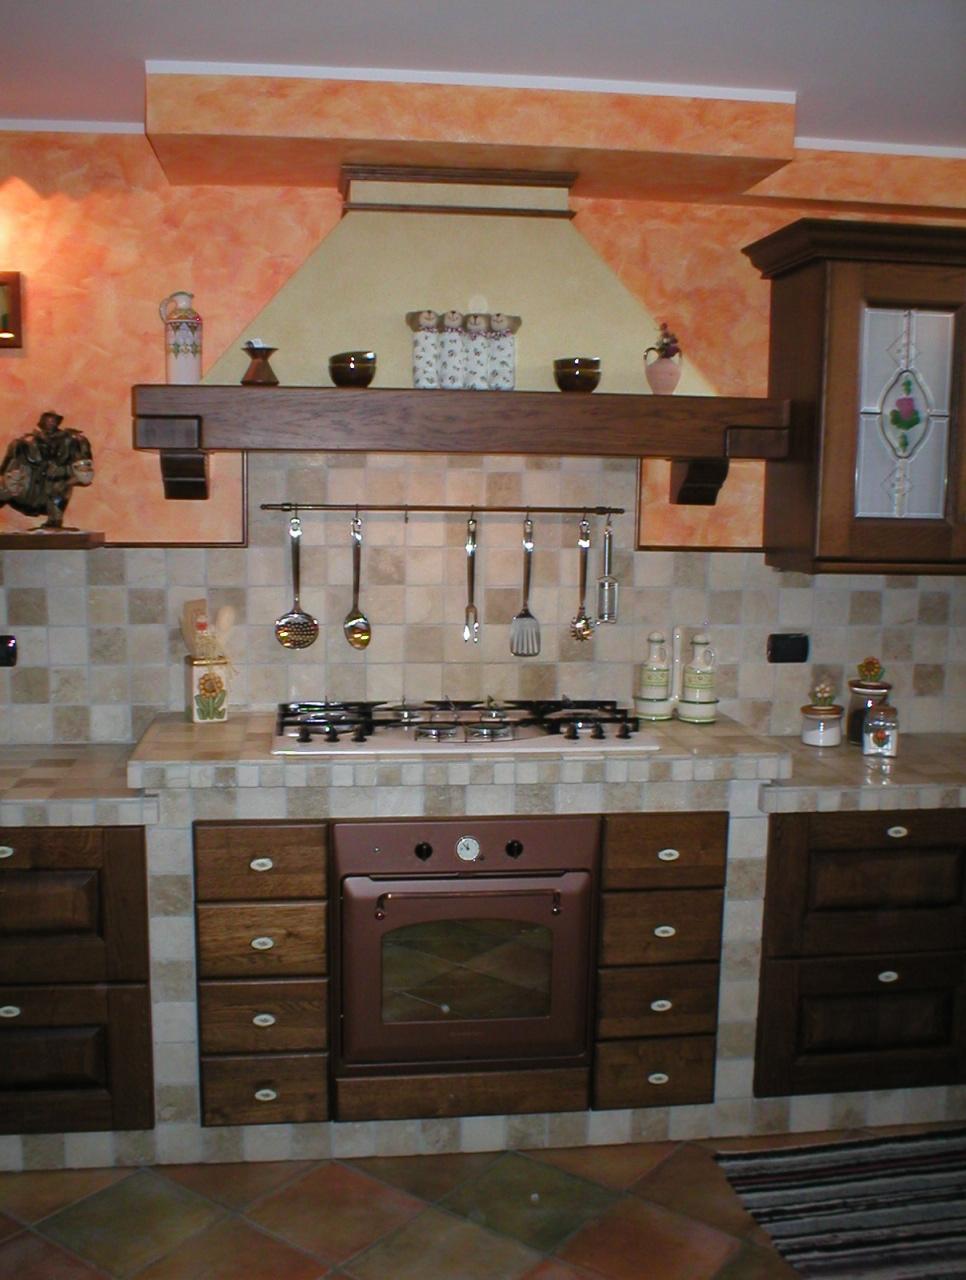 Cool piastrelle cucina stile provenzale rq13 pineglen - Piastrelle cucina ikea ...